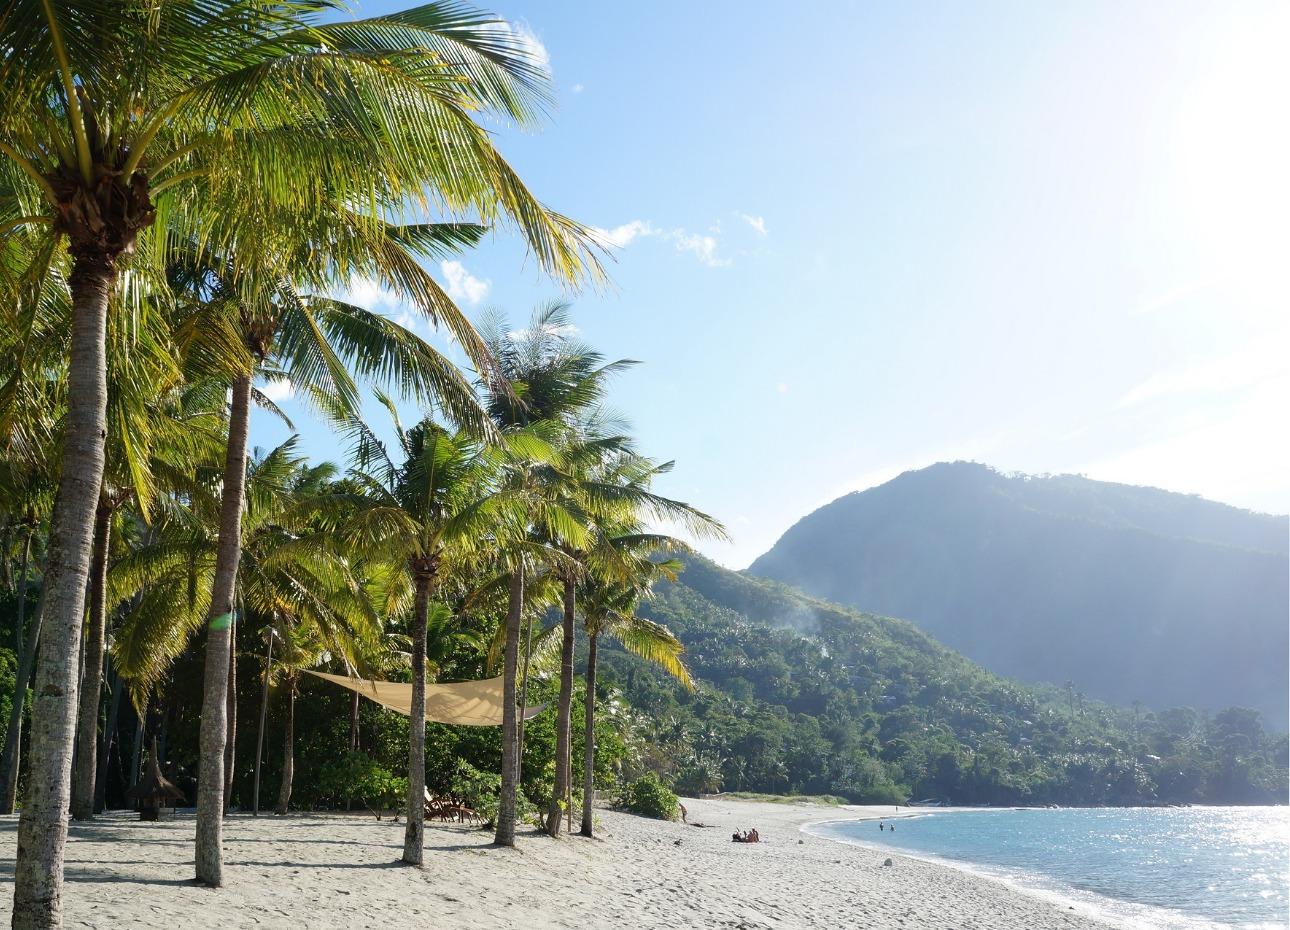 Philippines, Resort, Mountain backdrop, image,